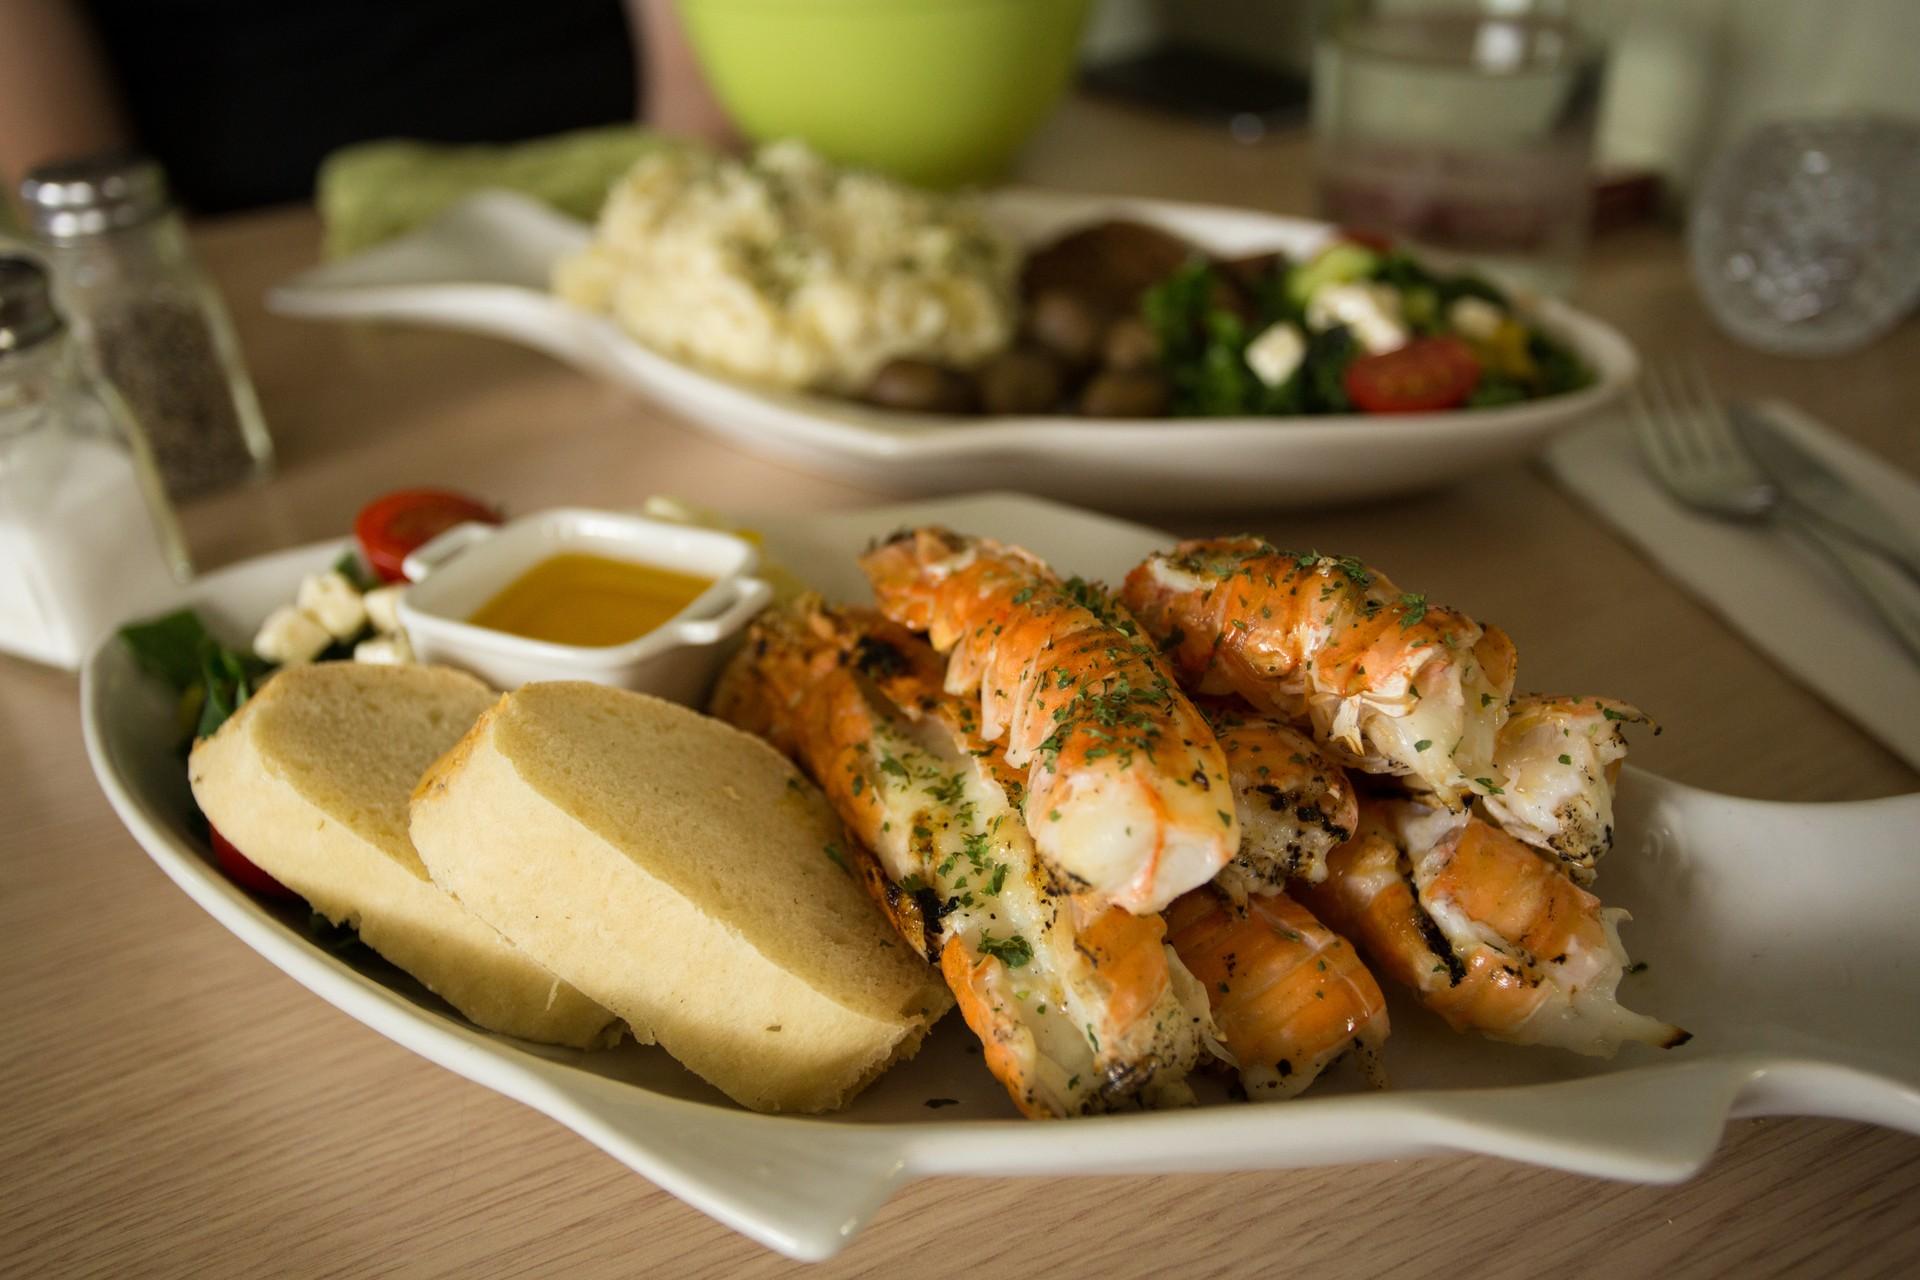 Icelandic meal